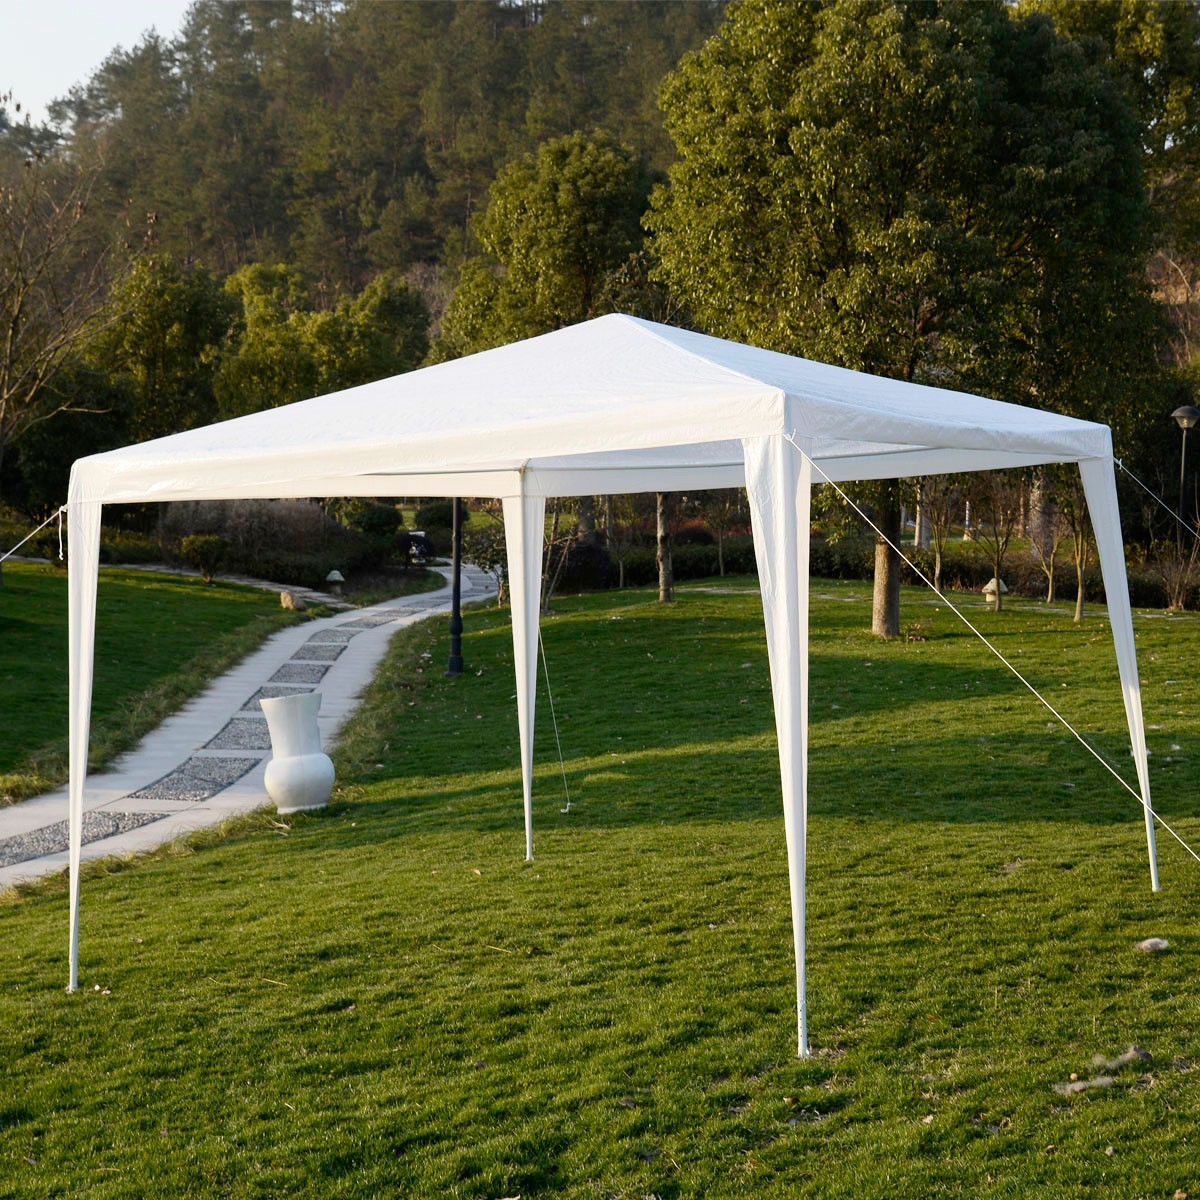 Apontus Outdoor Tent Canopy Gazebo, 10 x 10 (White) - Walmart.com